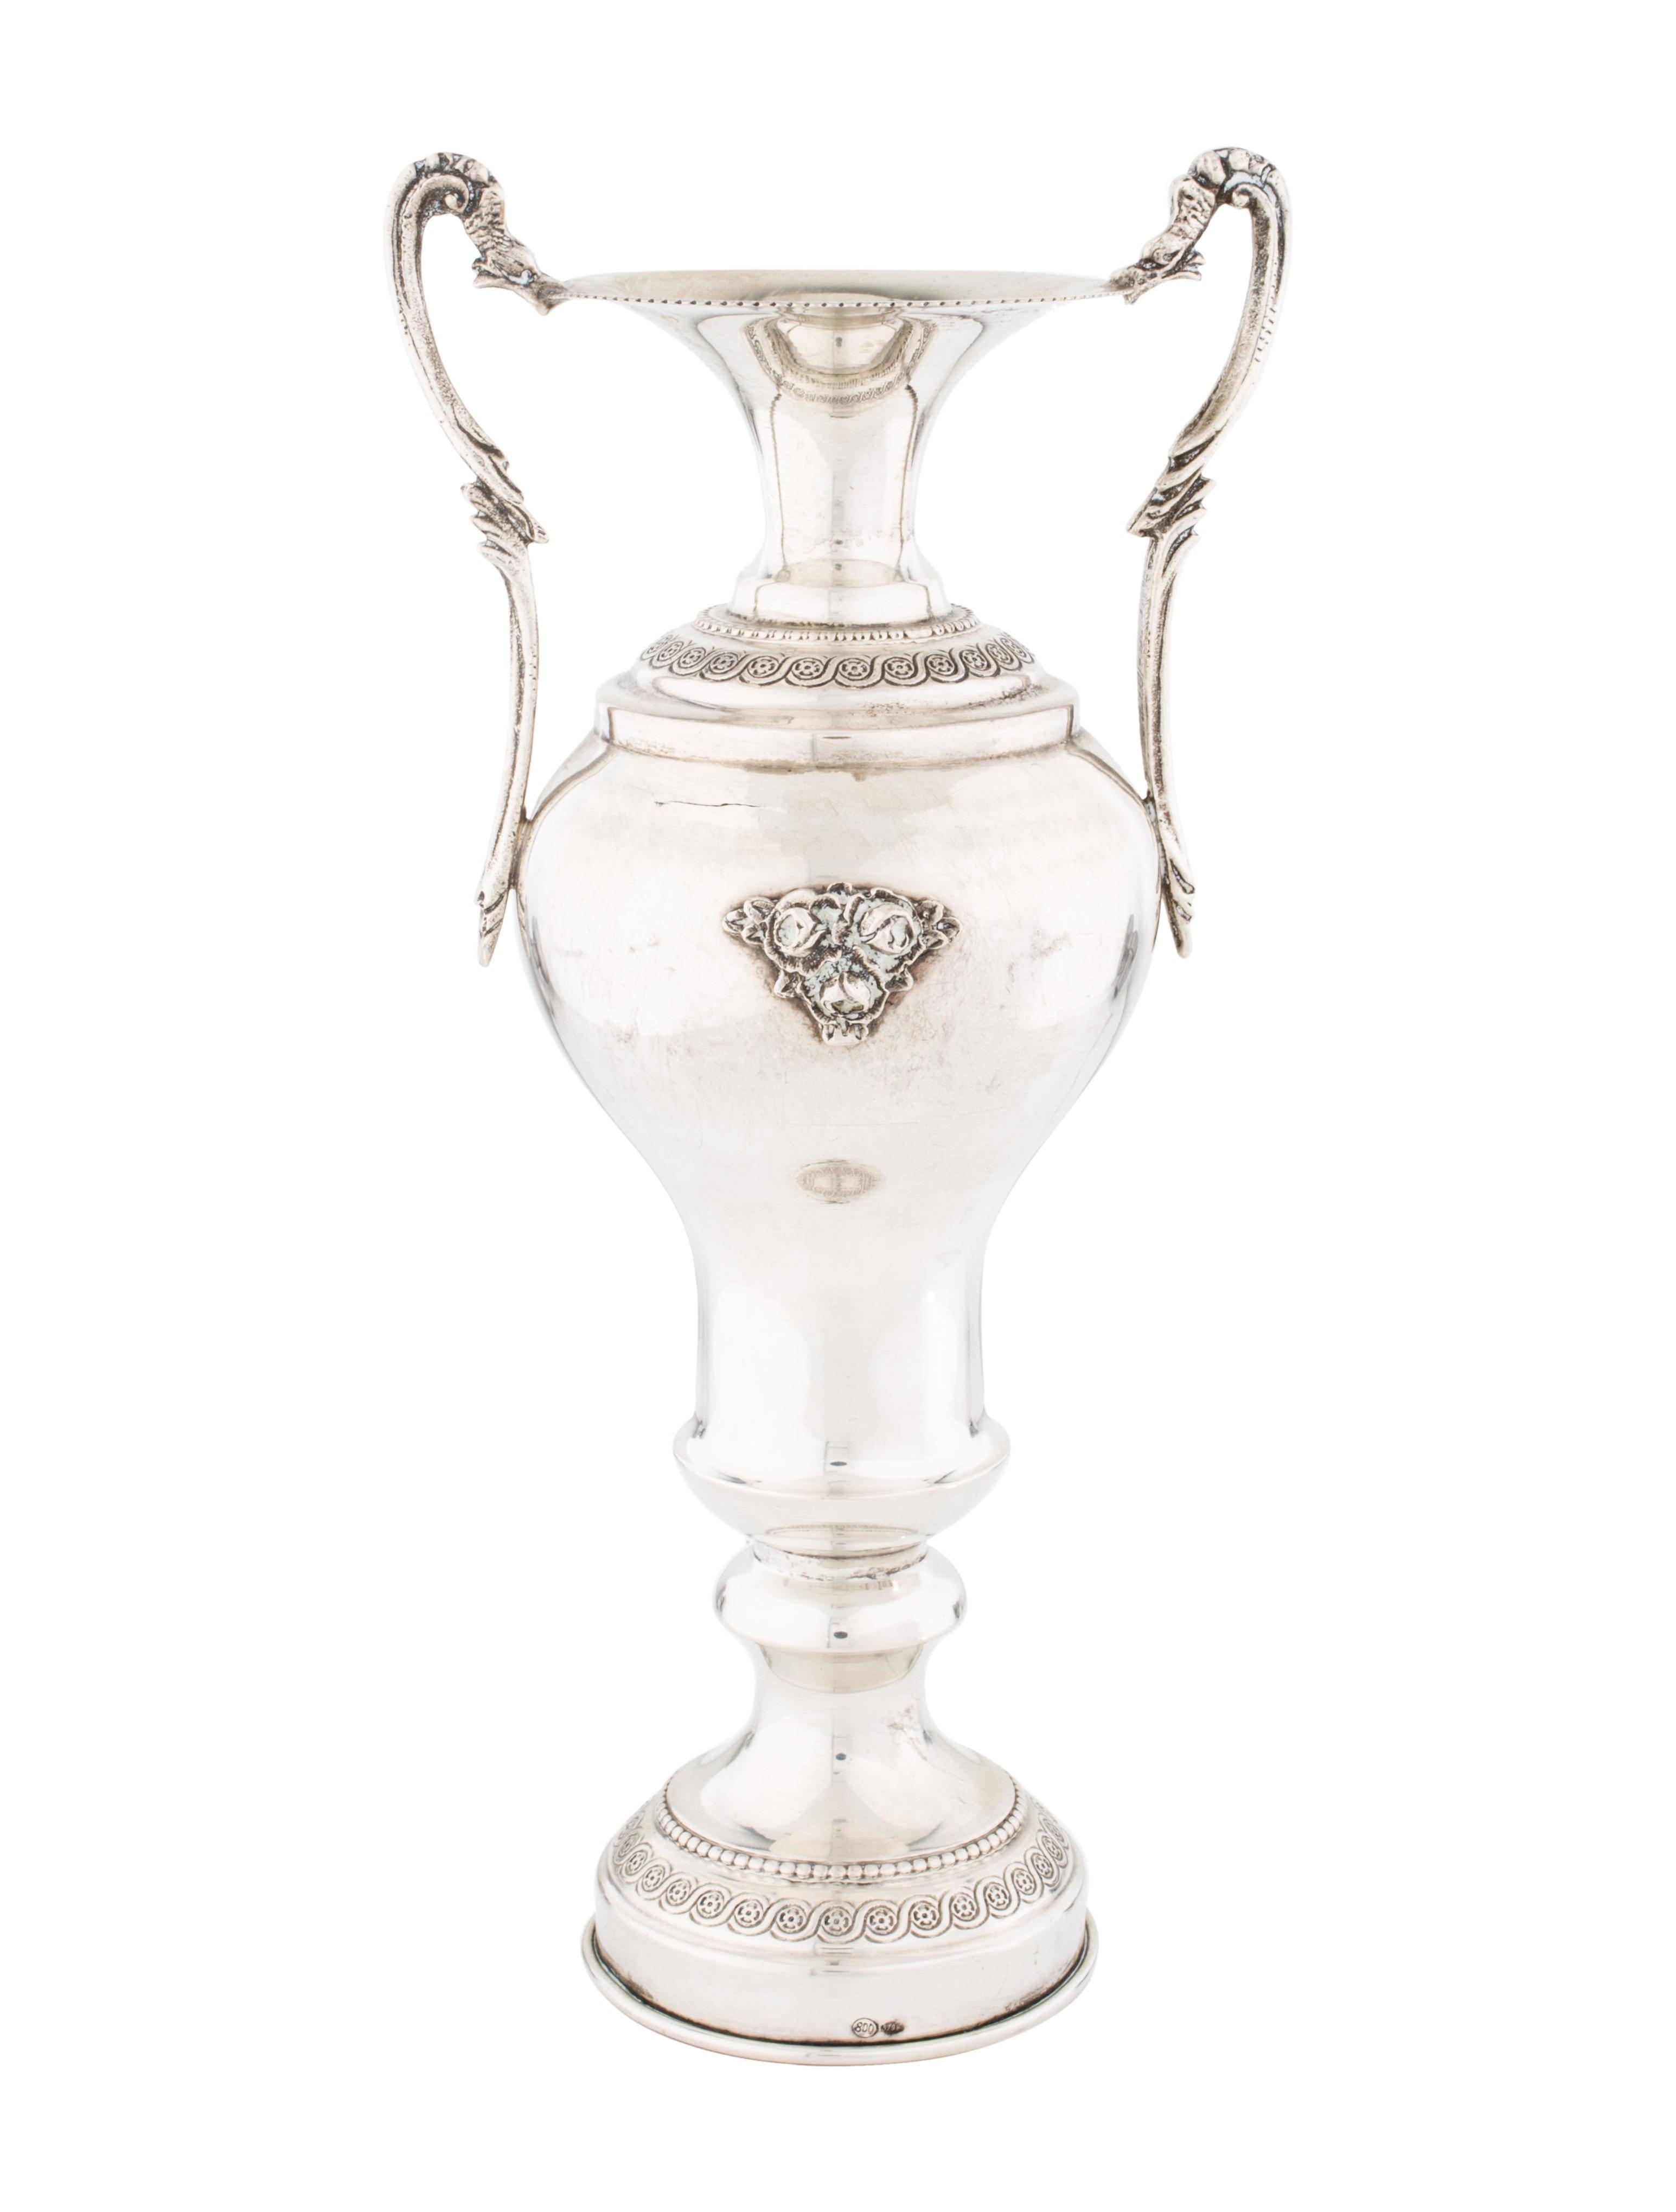 Silver italian miniature vase decor and accessories for Artistic accents genuine silver decoration